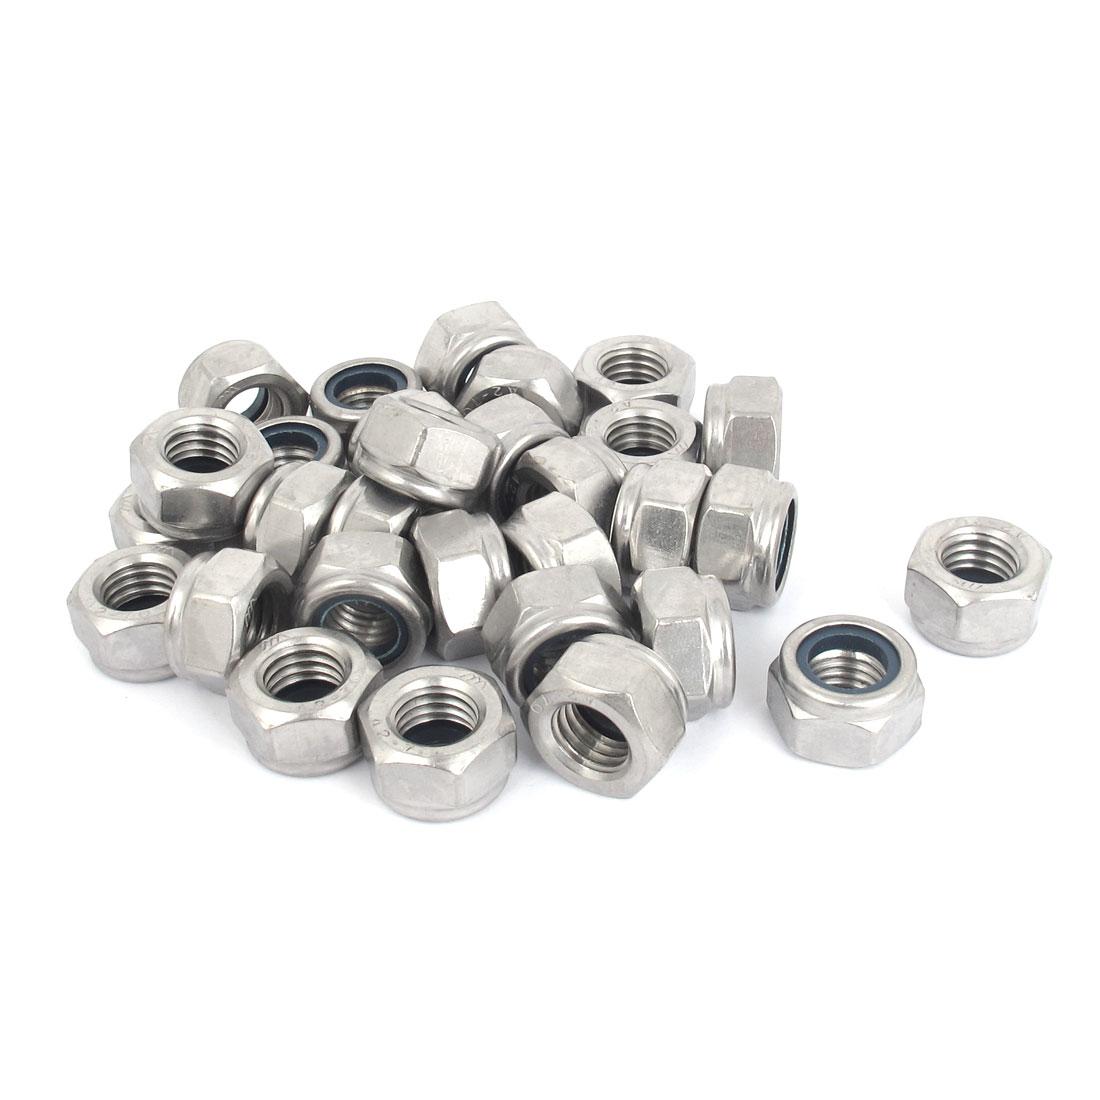 M14x2mm Stainless Steel Nylock Self-Locking Nylon Insert Hex Lock Nuts 30pcs